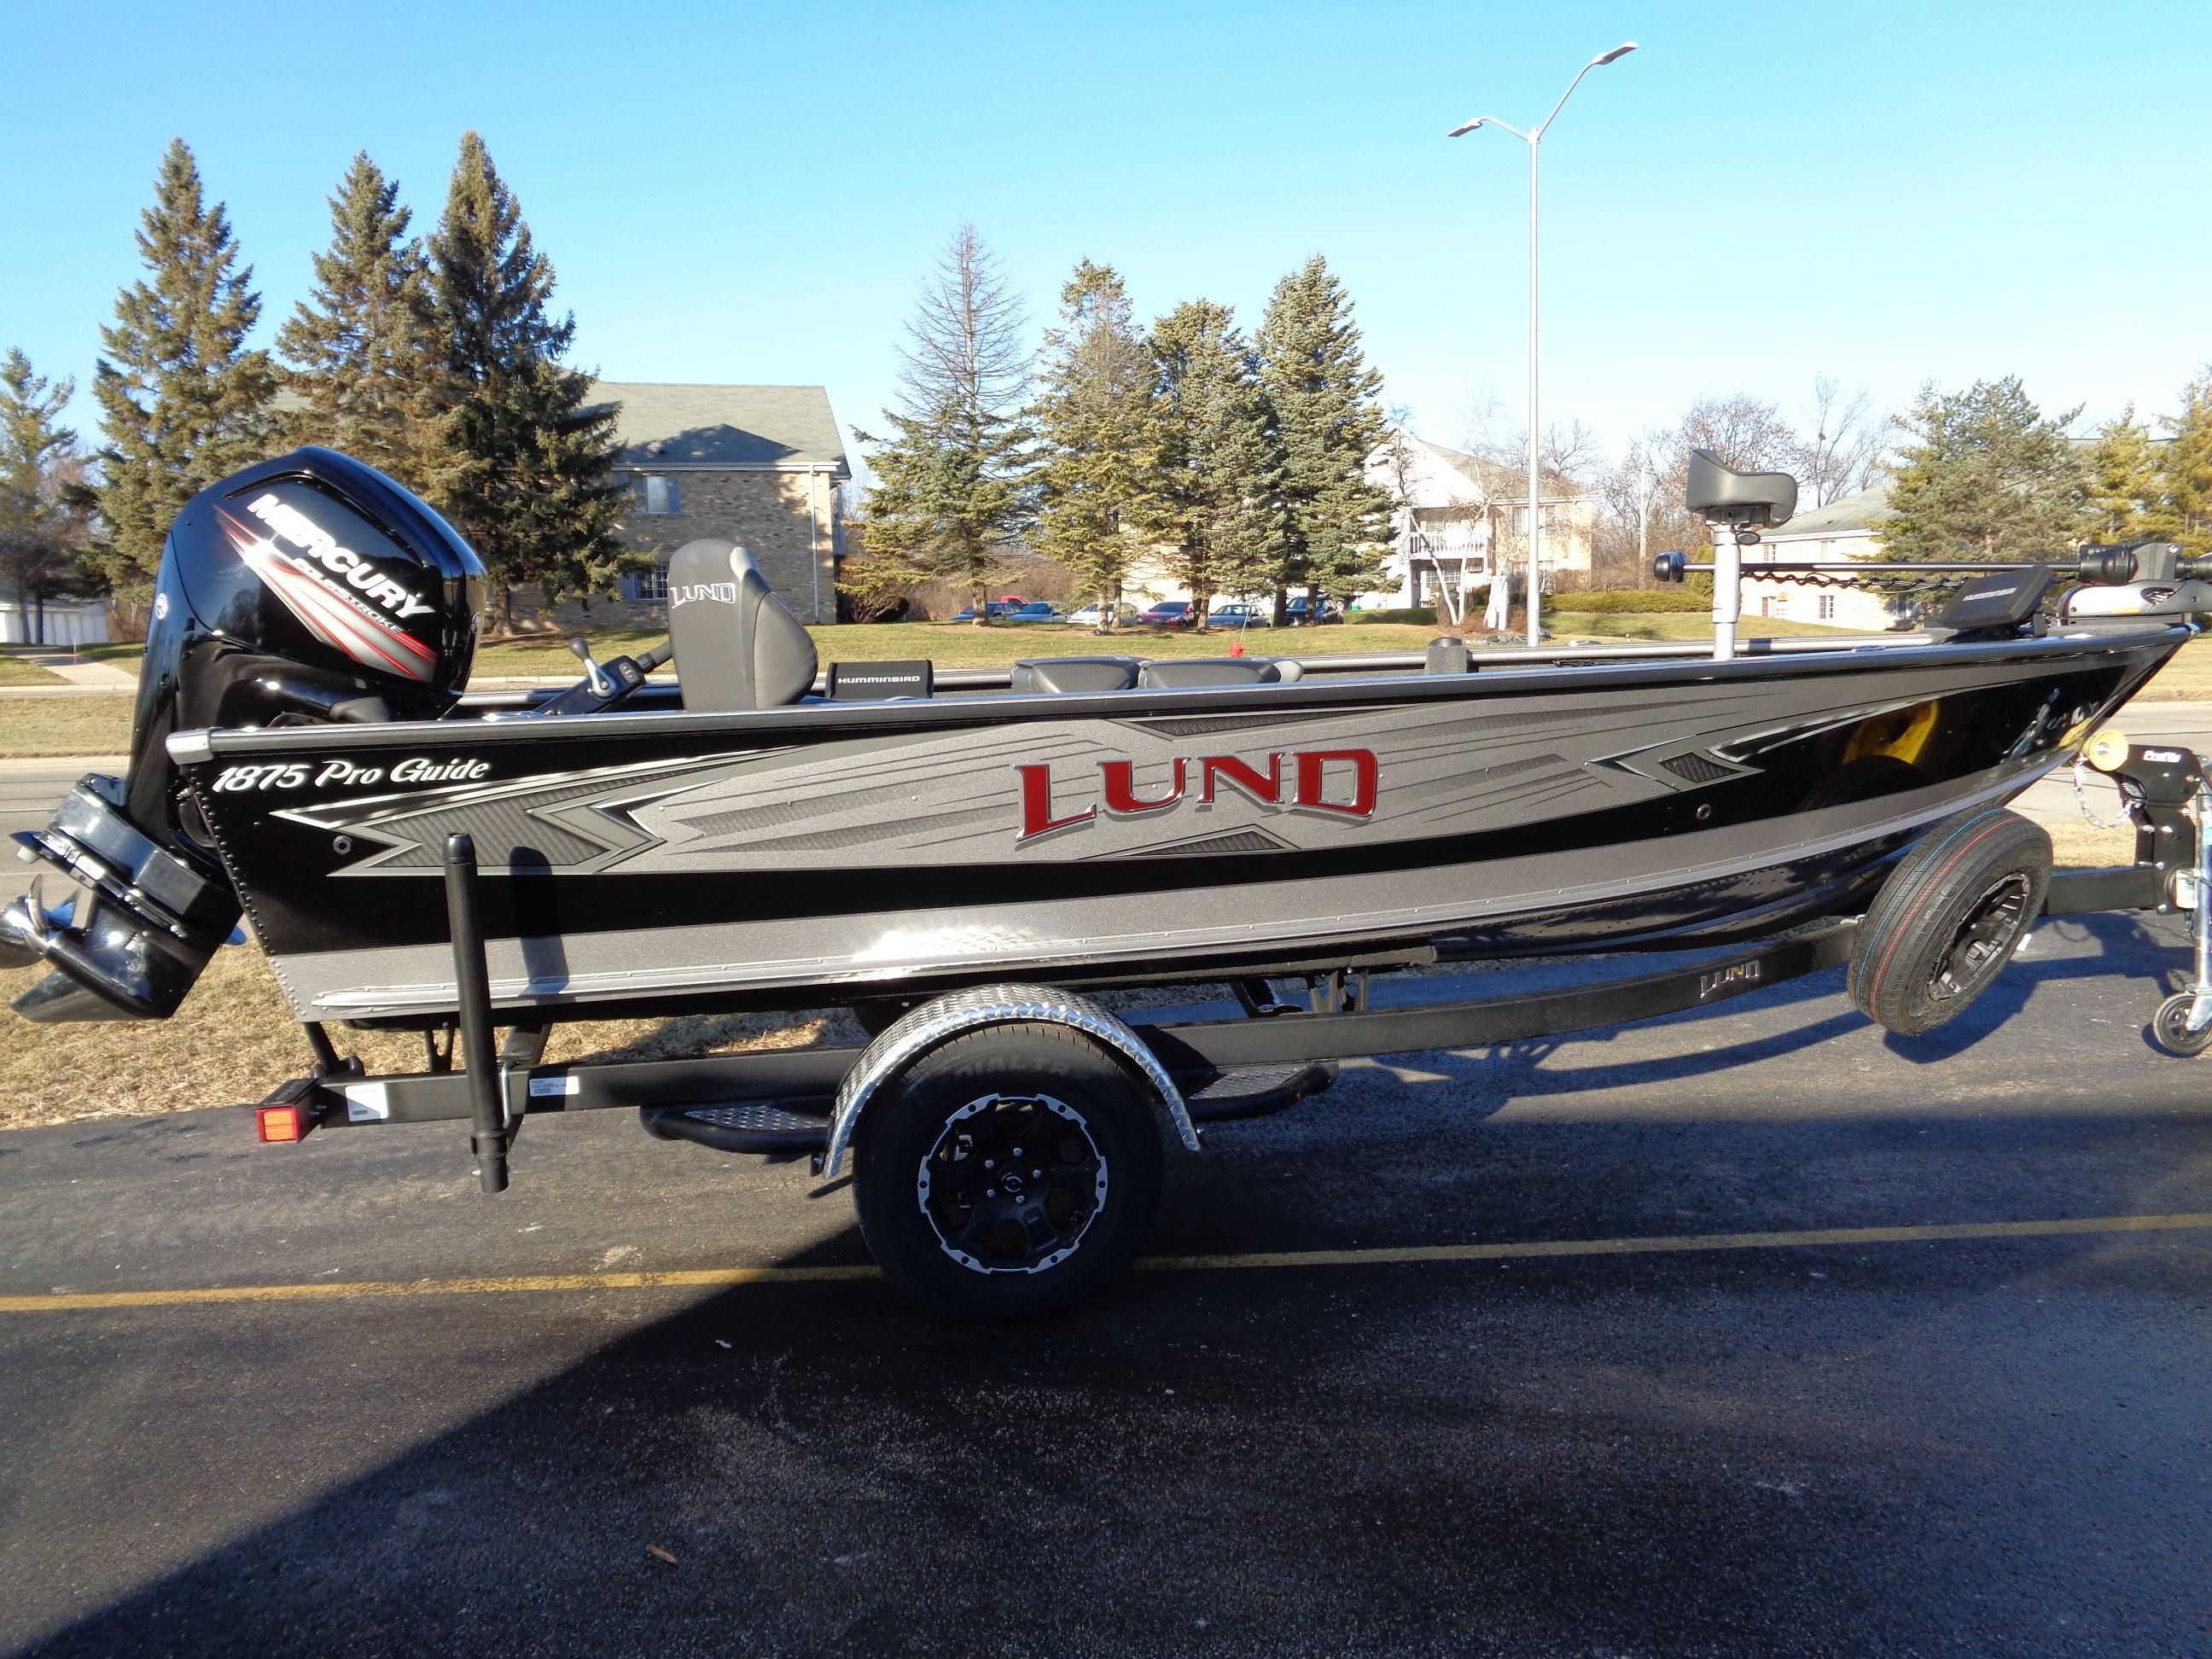 2019 Lund 1875 Pro Guide Hales Corners, Wisconsin - M-W Marine